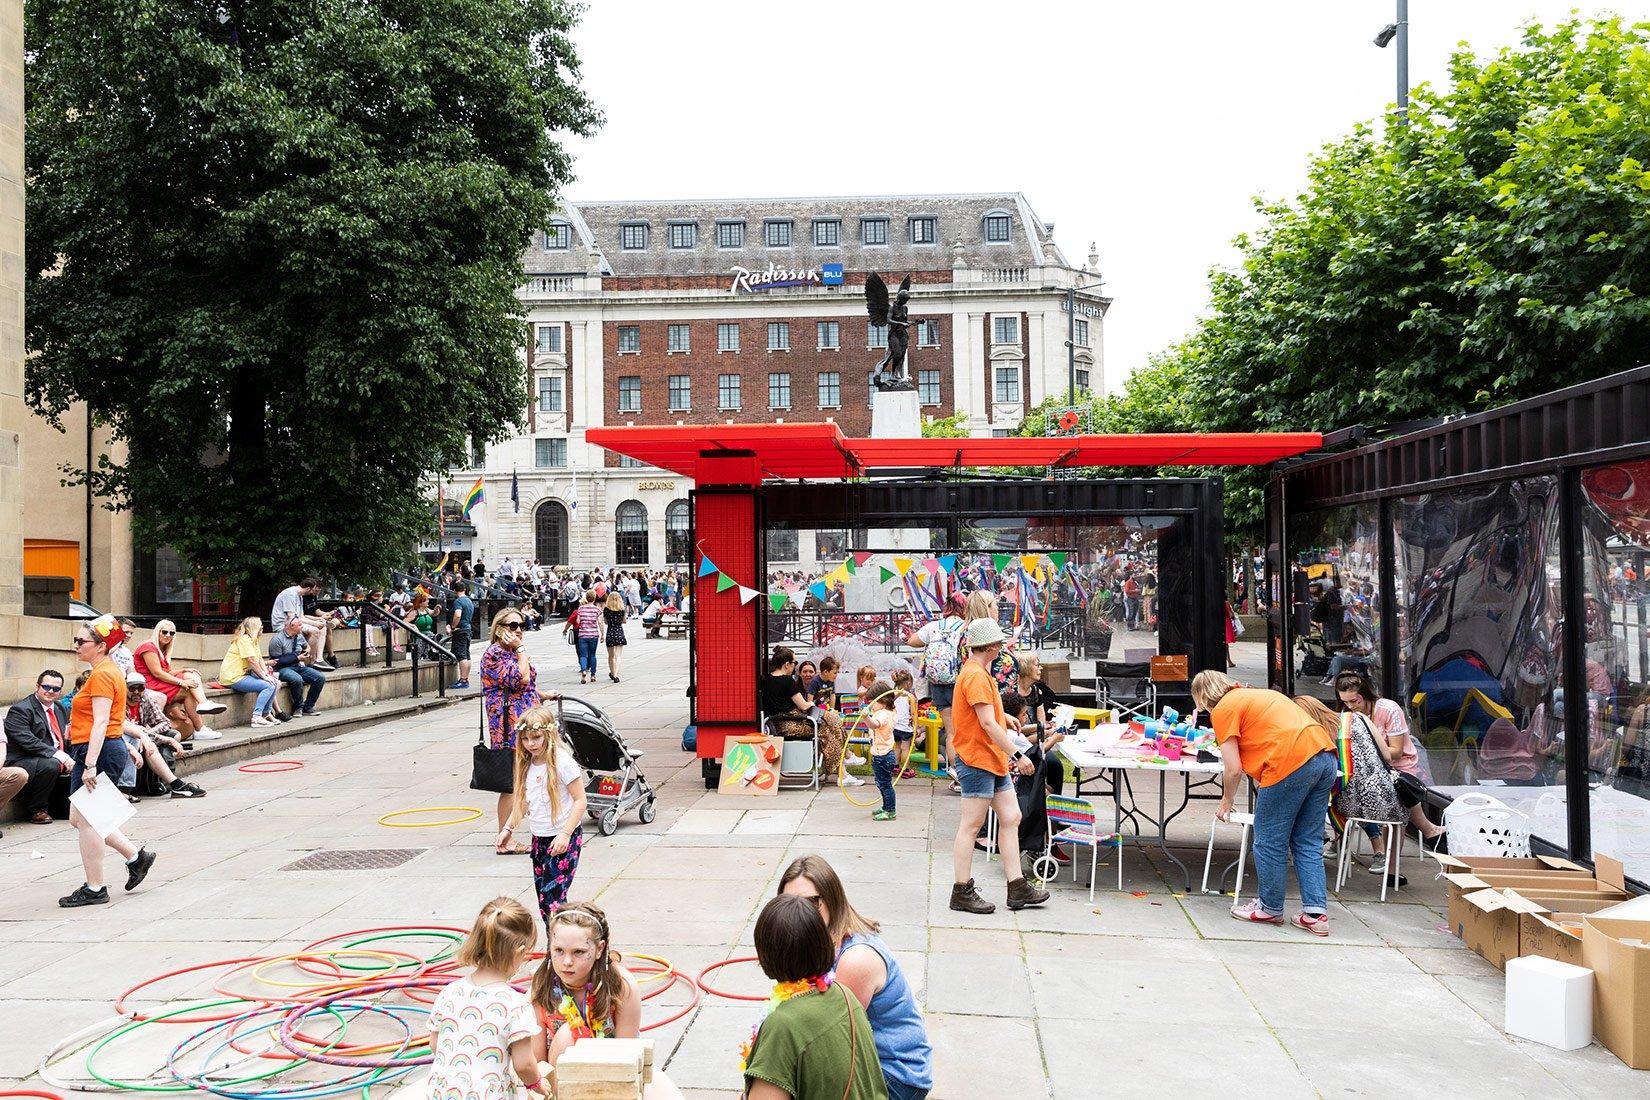 Create, Sculpt, Play 2019, outside Victoria Gardens, Leeds Photograph by Nicholas Singleton